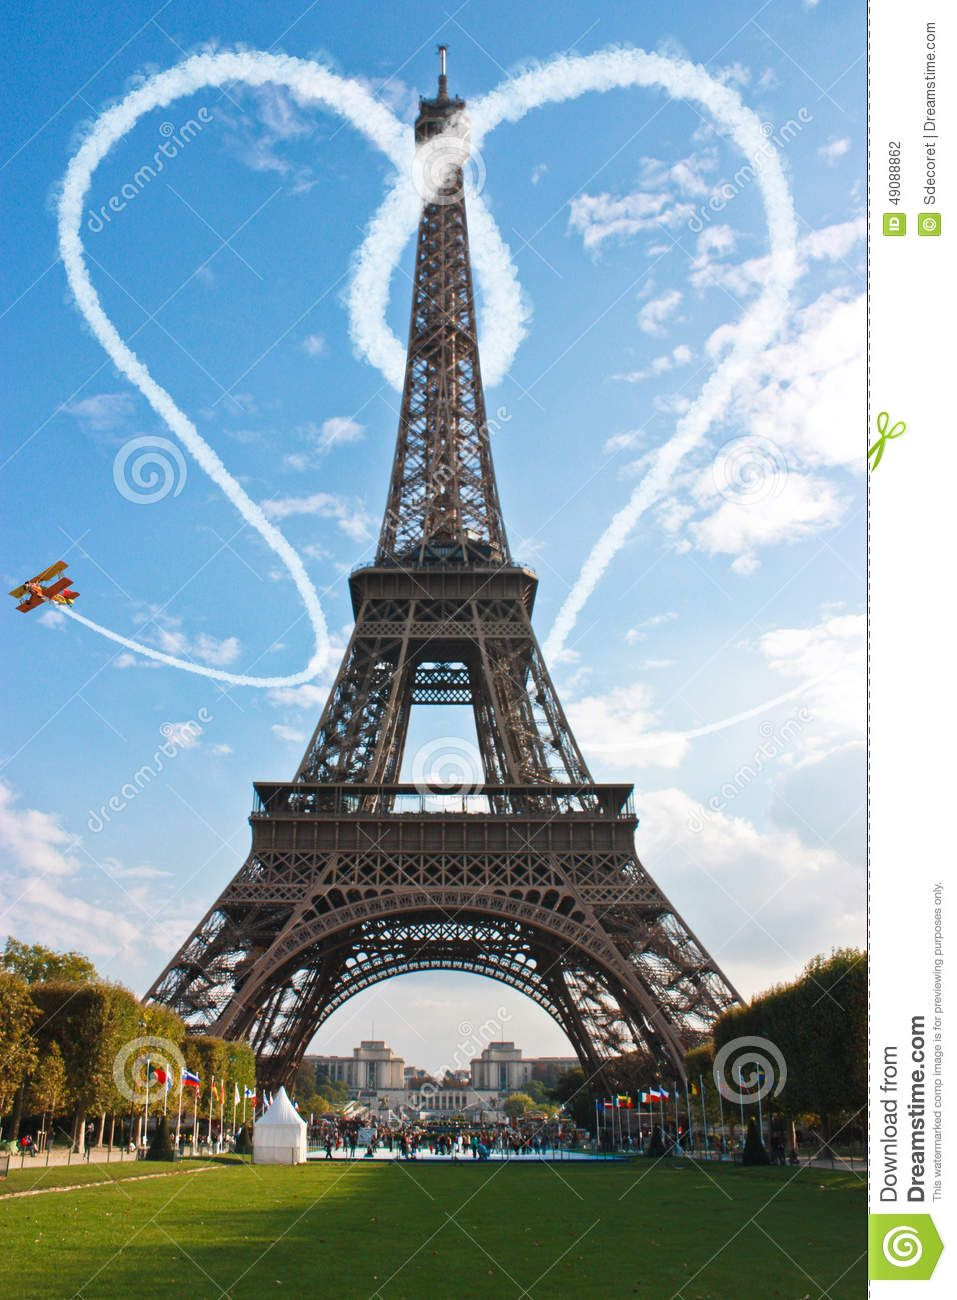 Fotos la torre de eiffel